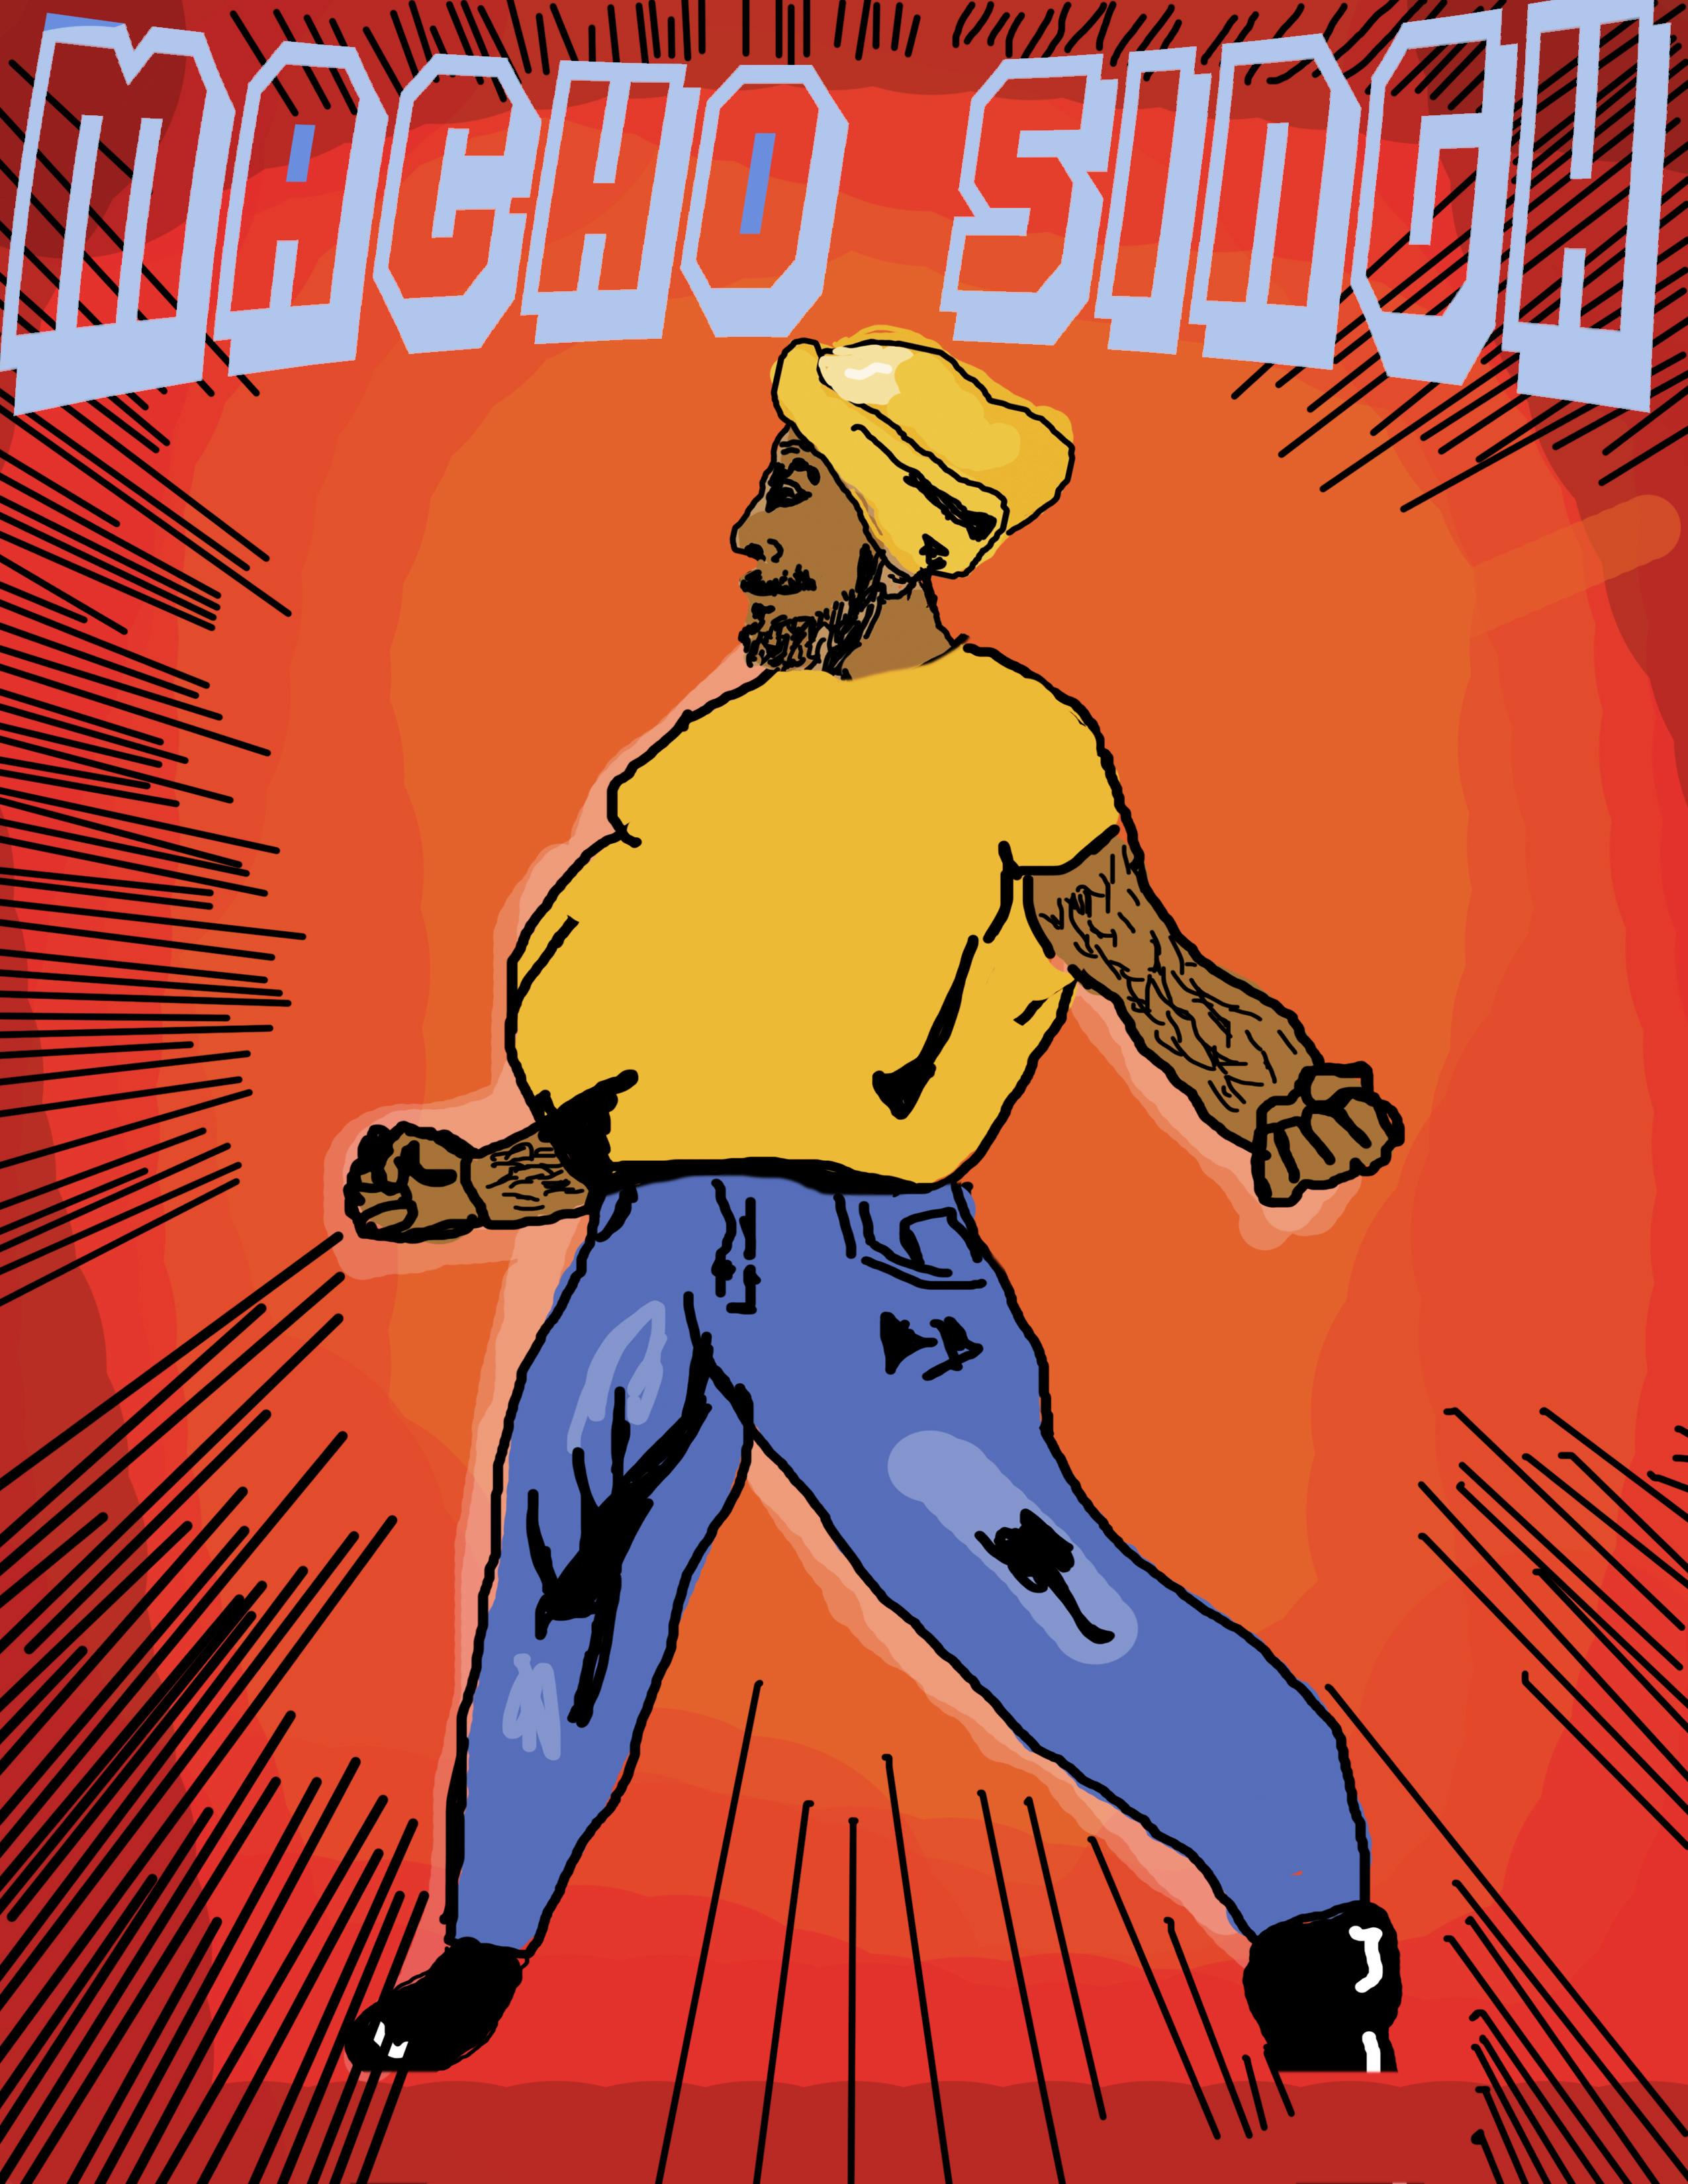 Macho Singh (Comic Book)